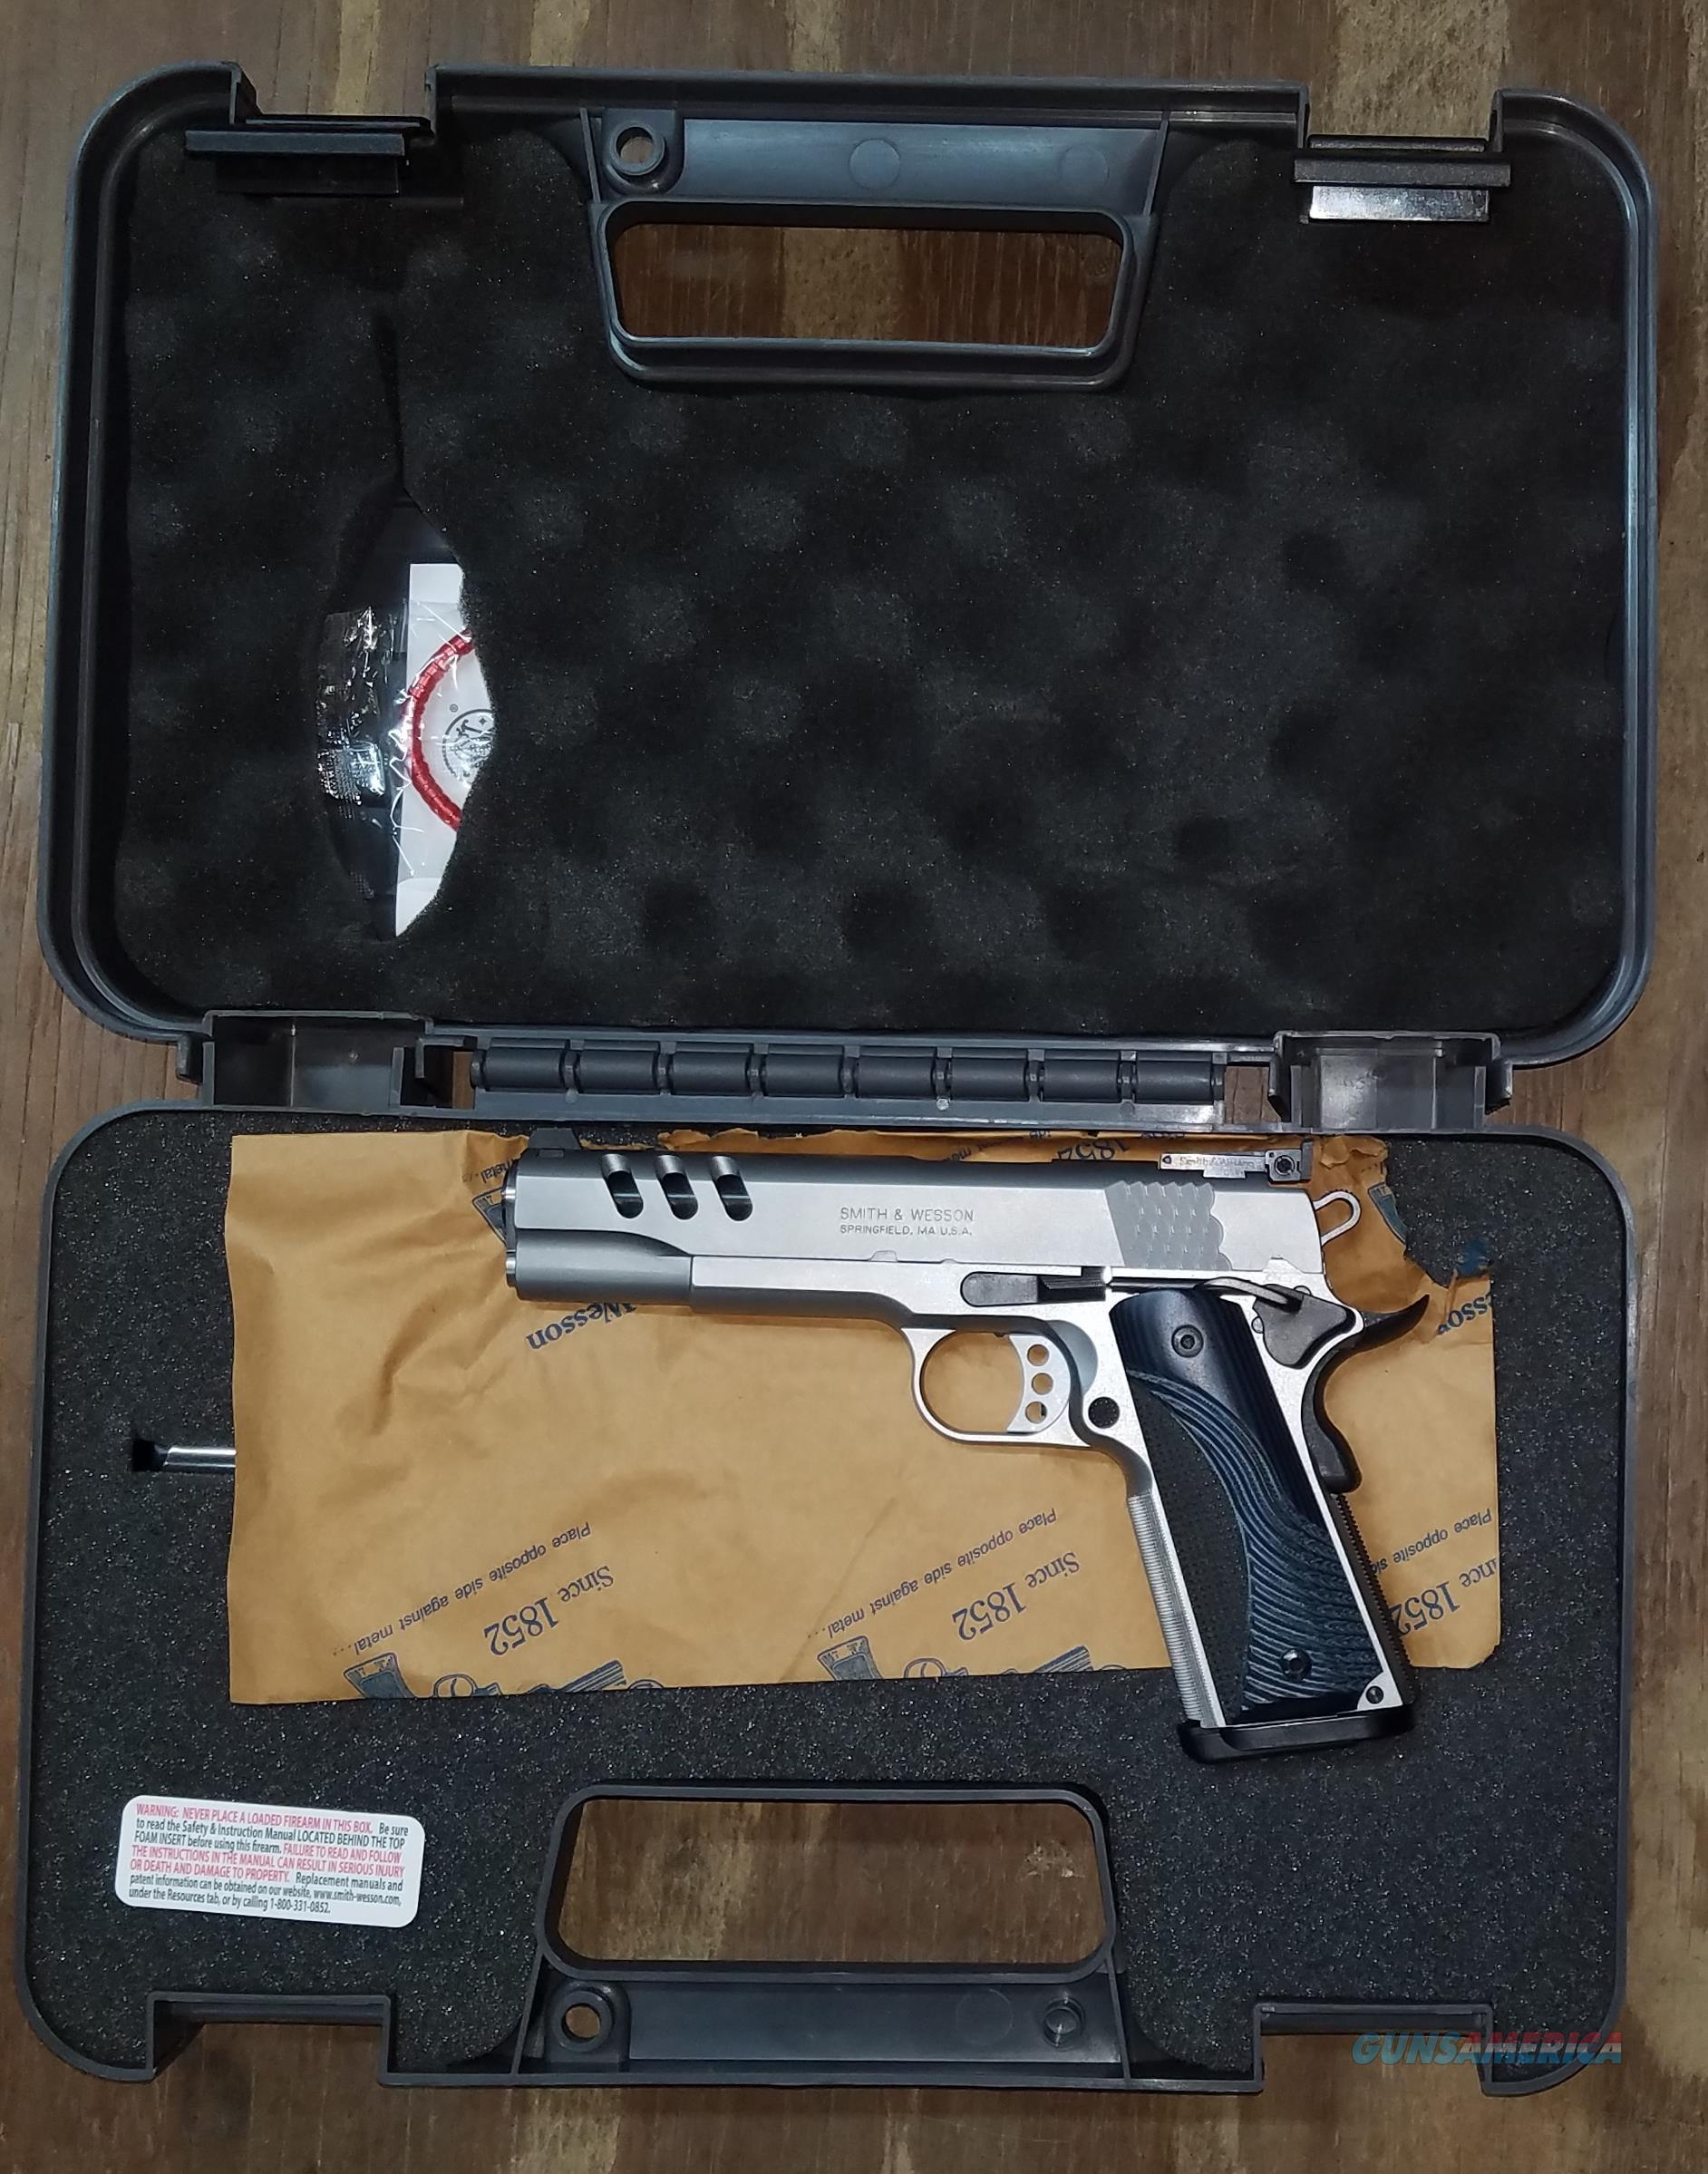 Smith & Wesson 1911 Performance Center 45 Auto 170343  Guns > Pistols > Smith & Wesson Pistols - Autos > Steel Frame